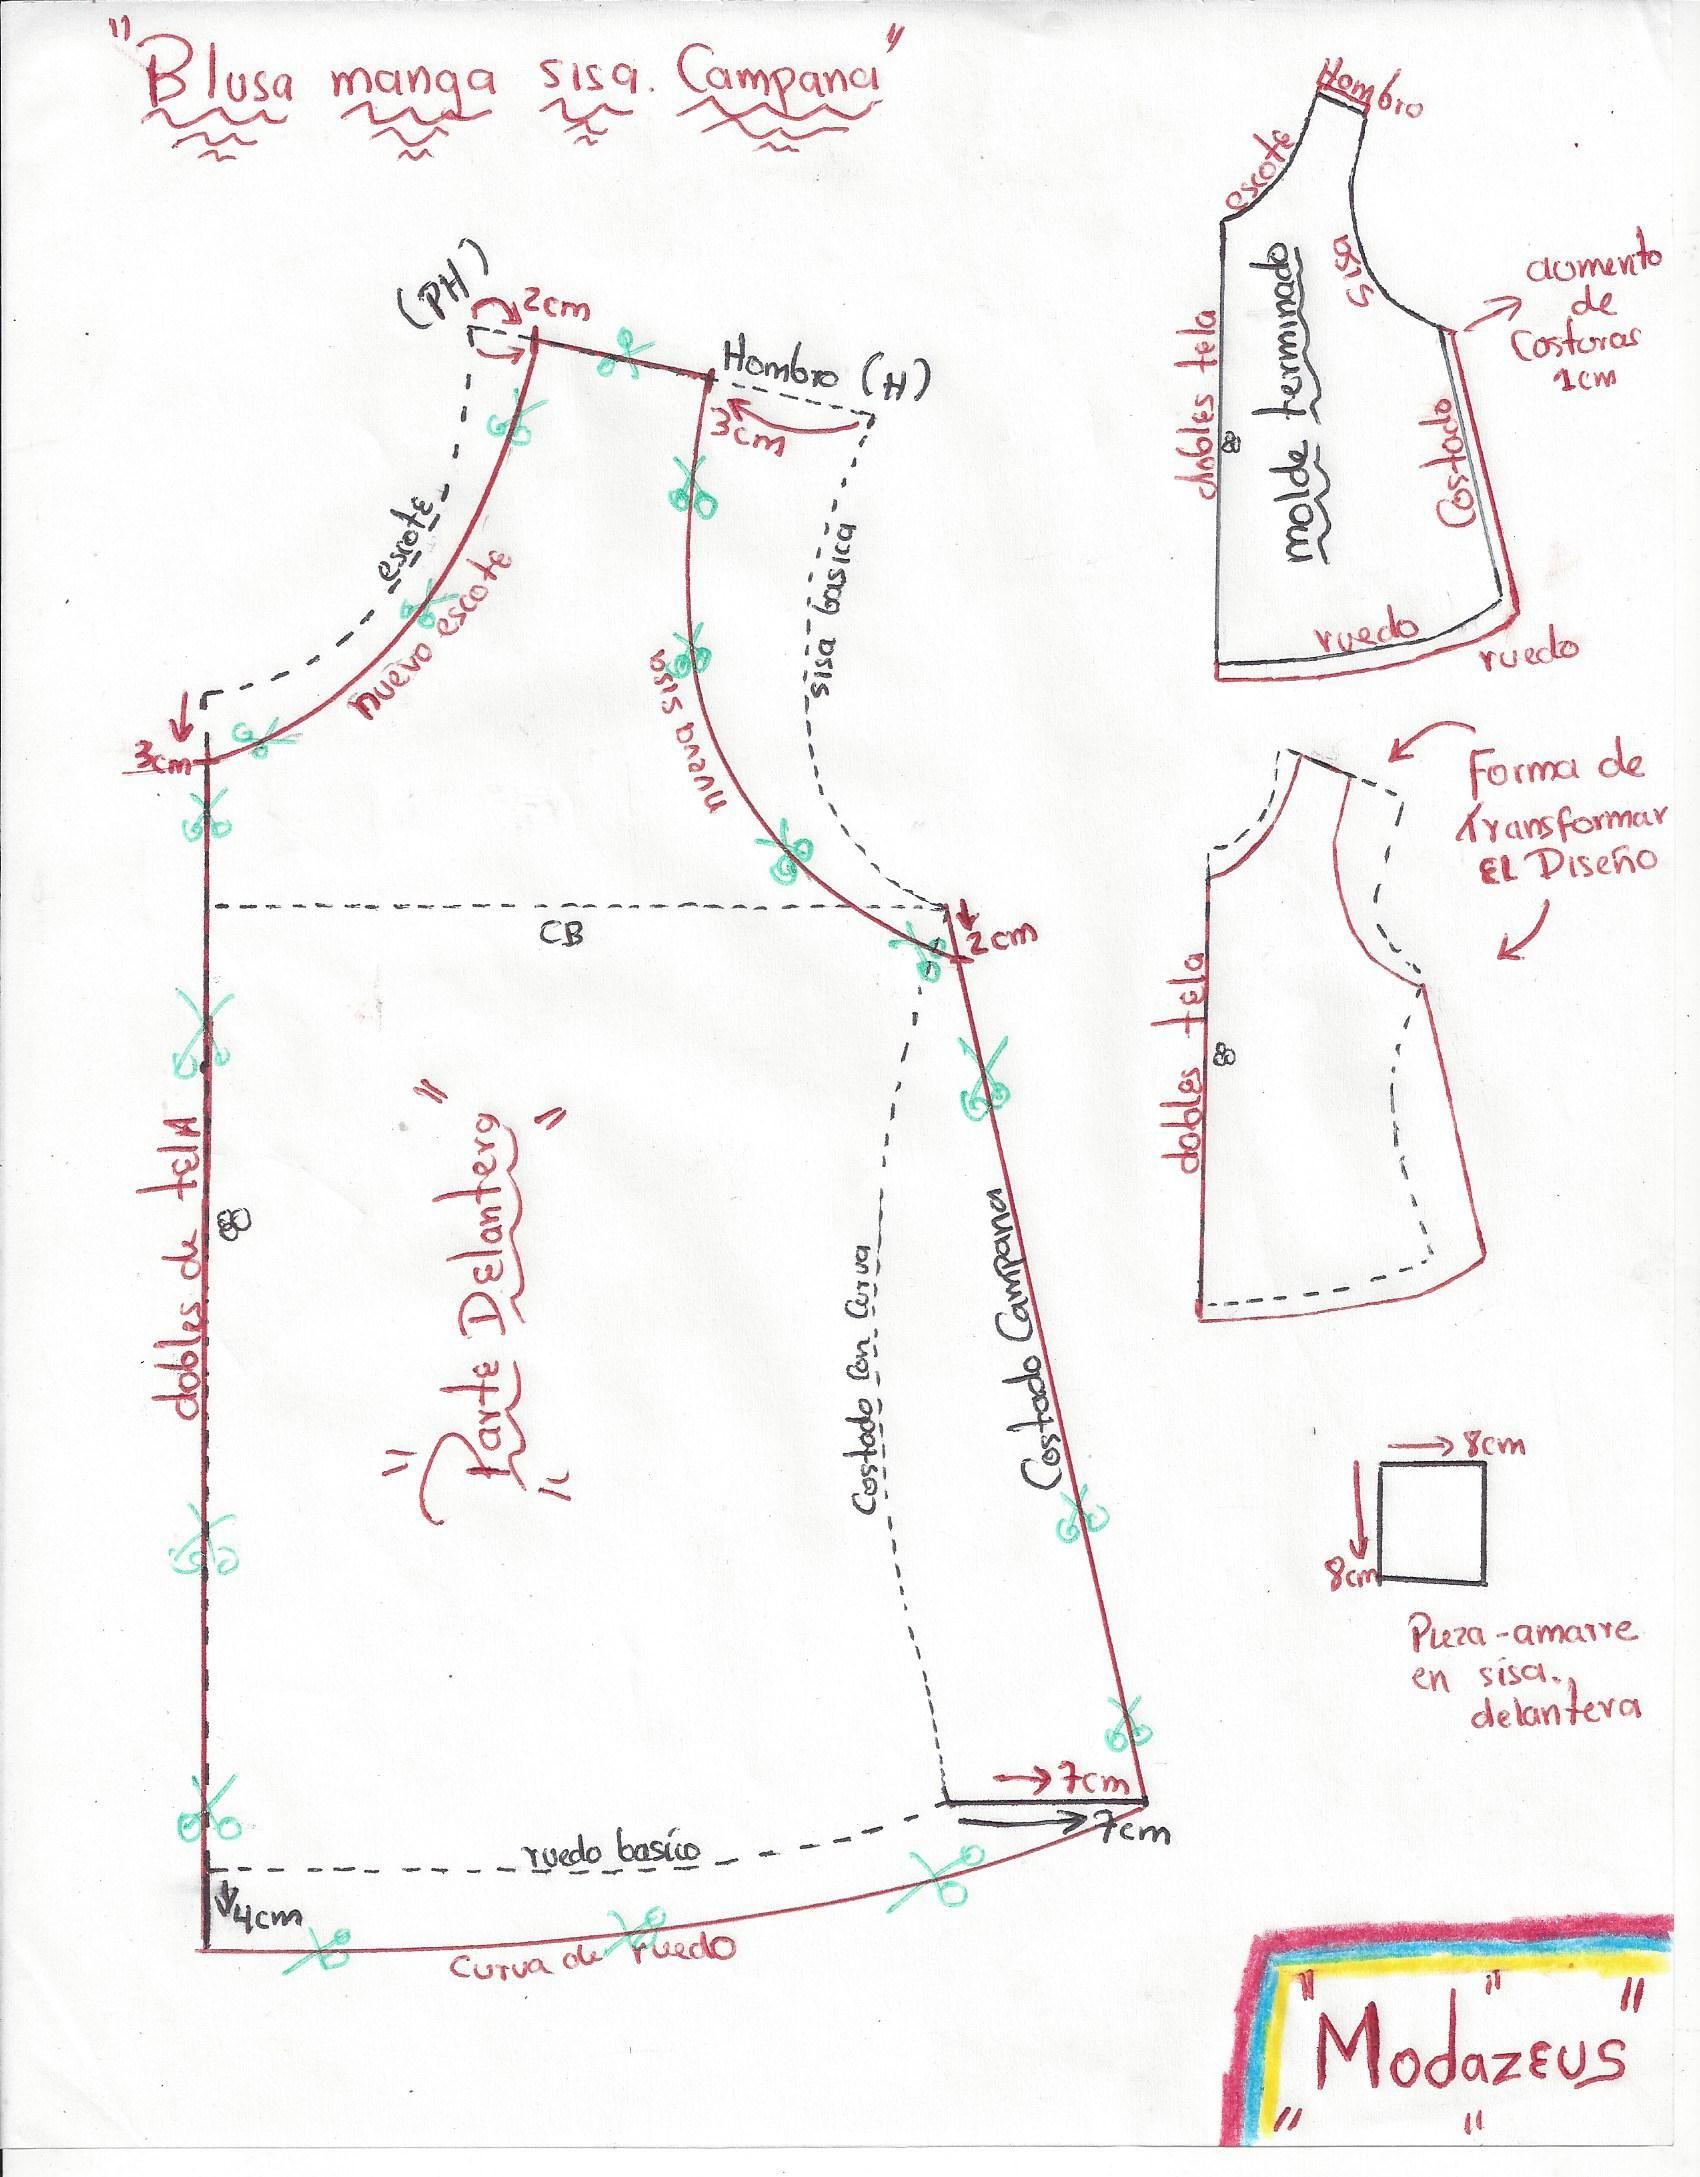 moldes de blusa para niñas, diseño amplio-campana manga sisa ...